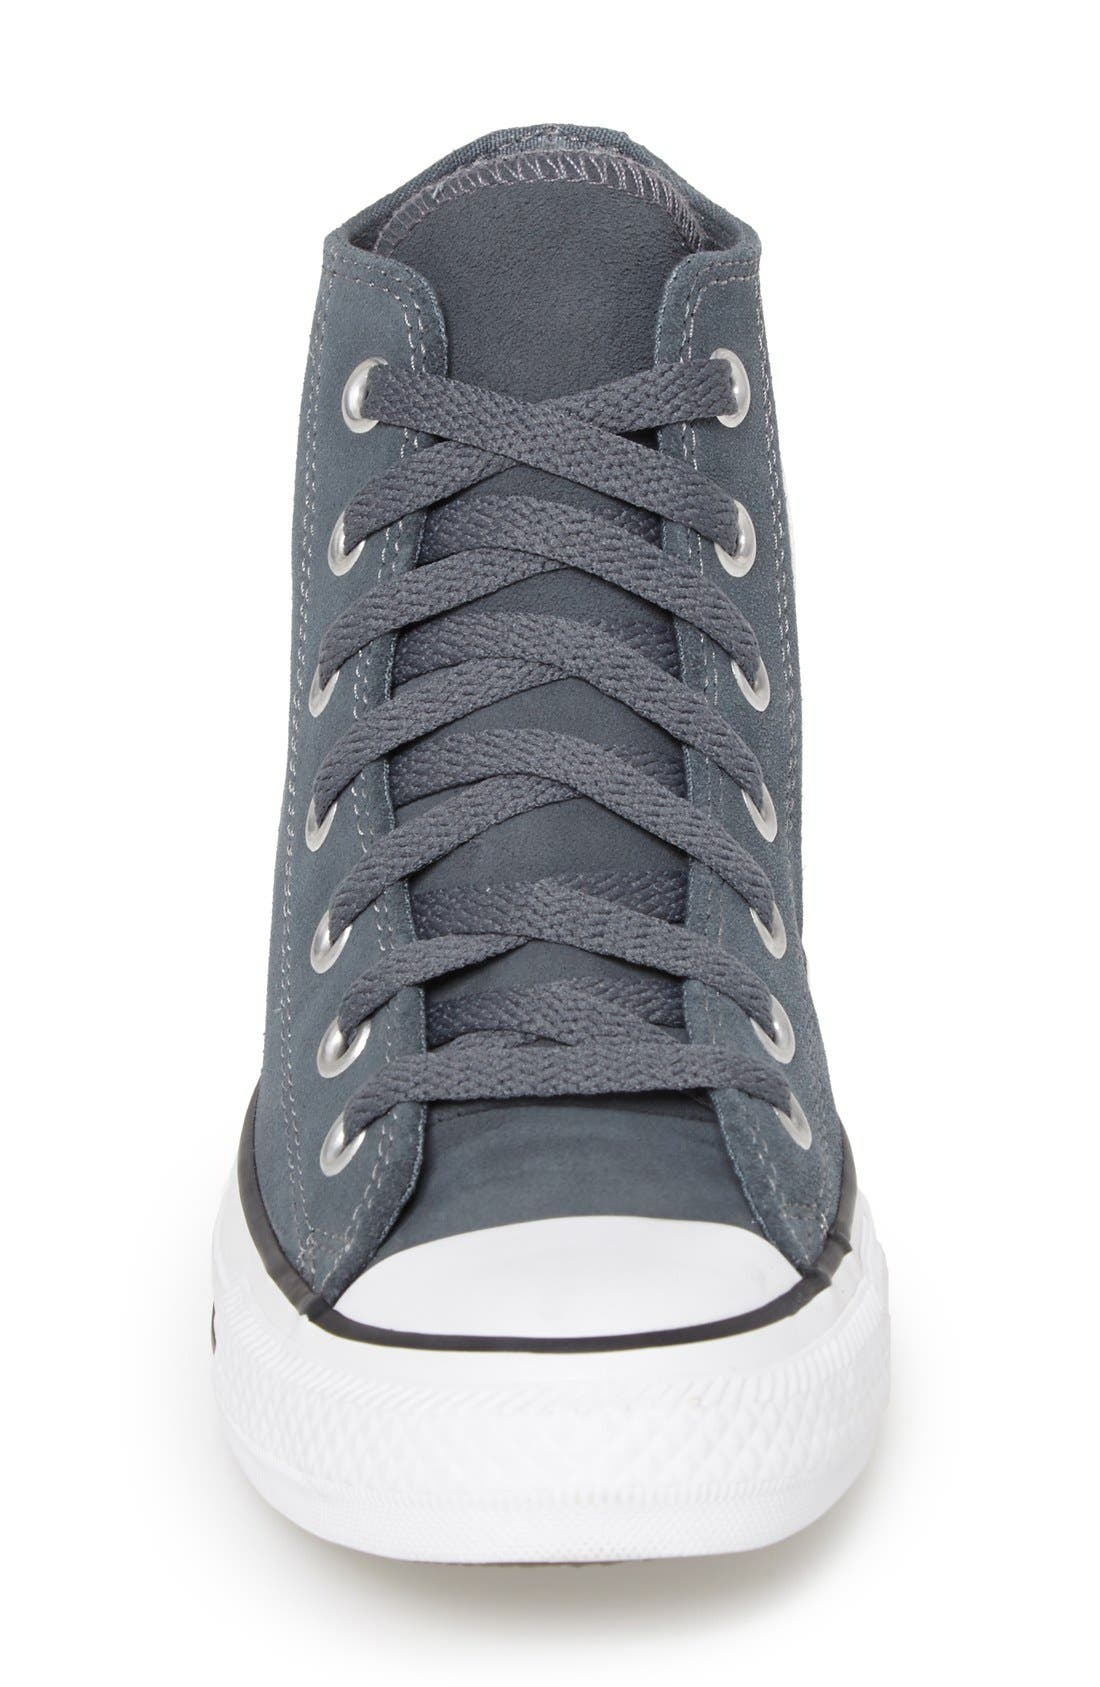 Alternate Image 2  - Converse Chuck Taylor® All Star® Suede High Top Sneaker (Women)